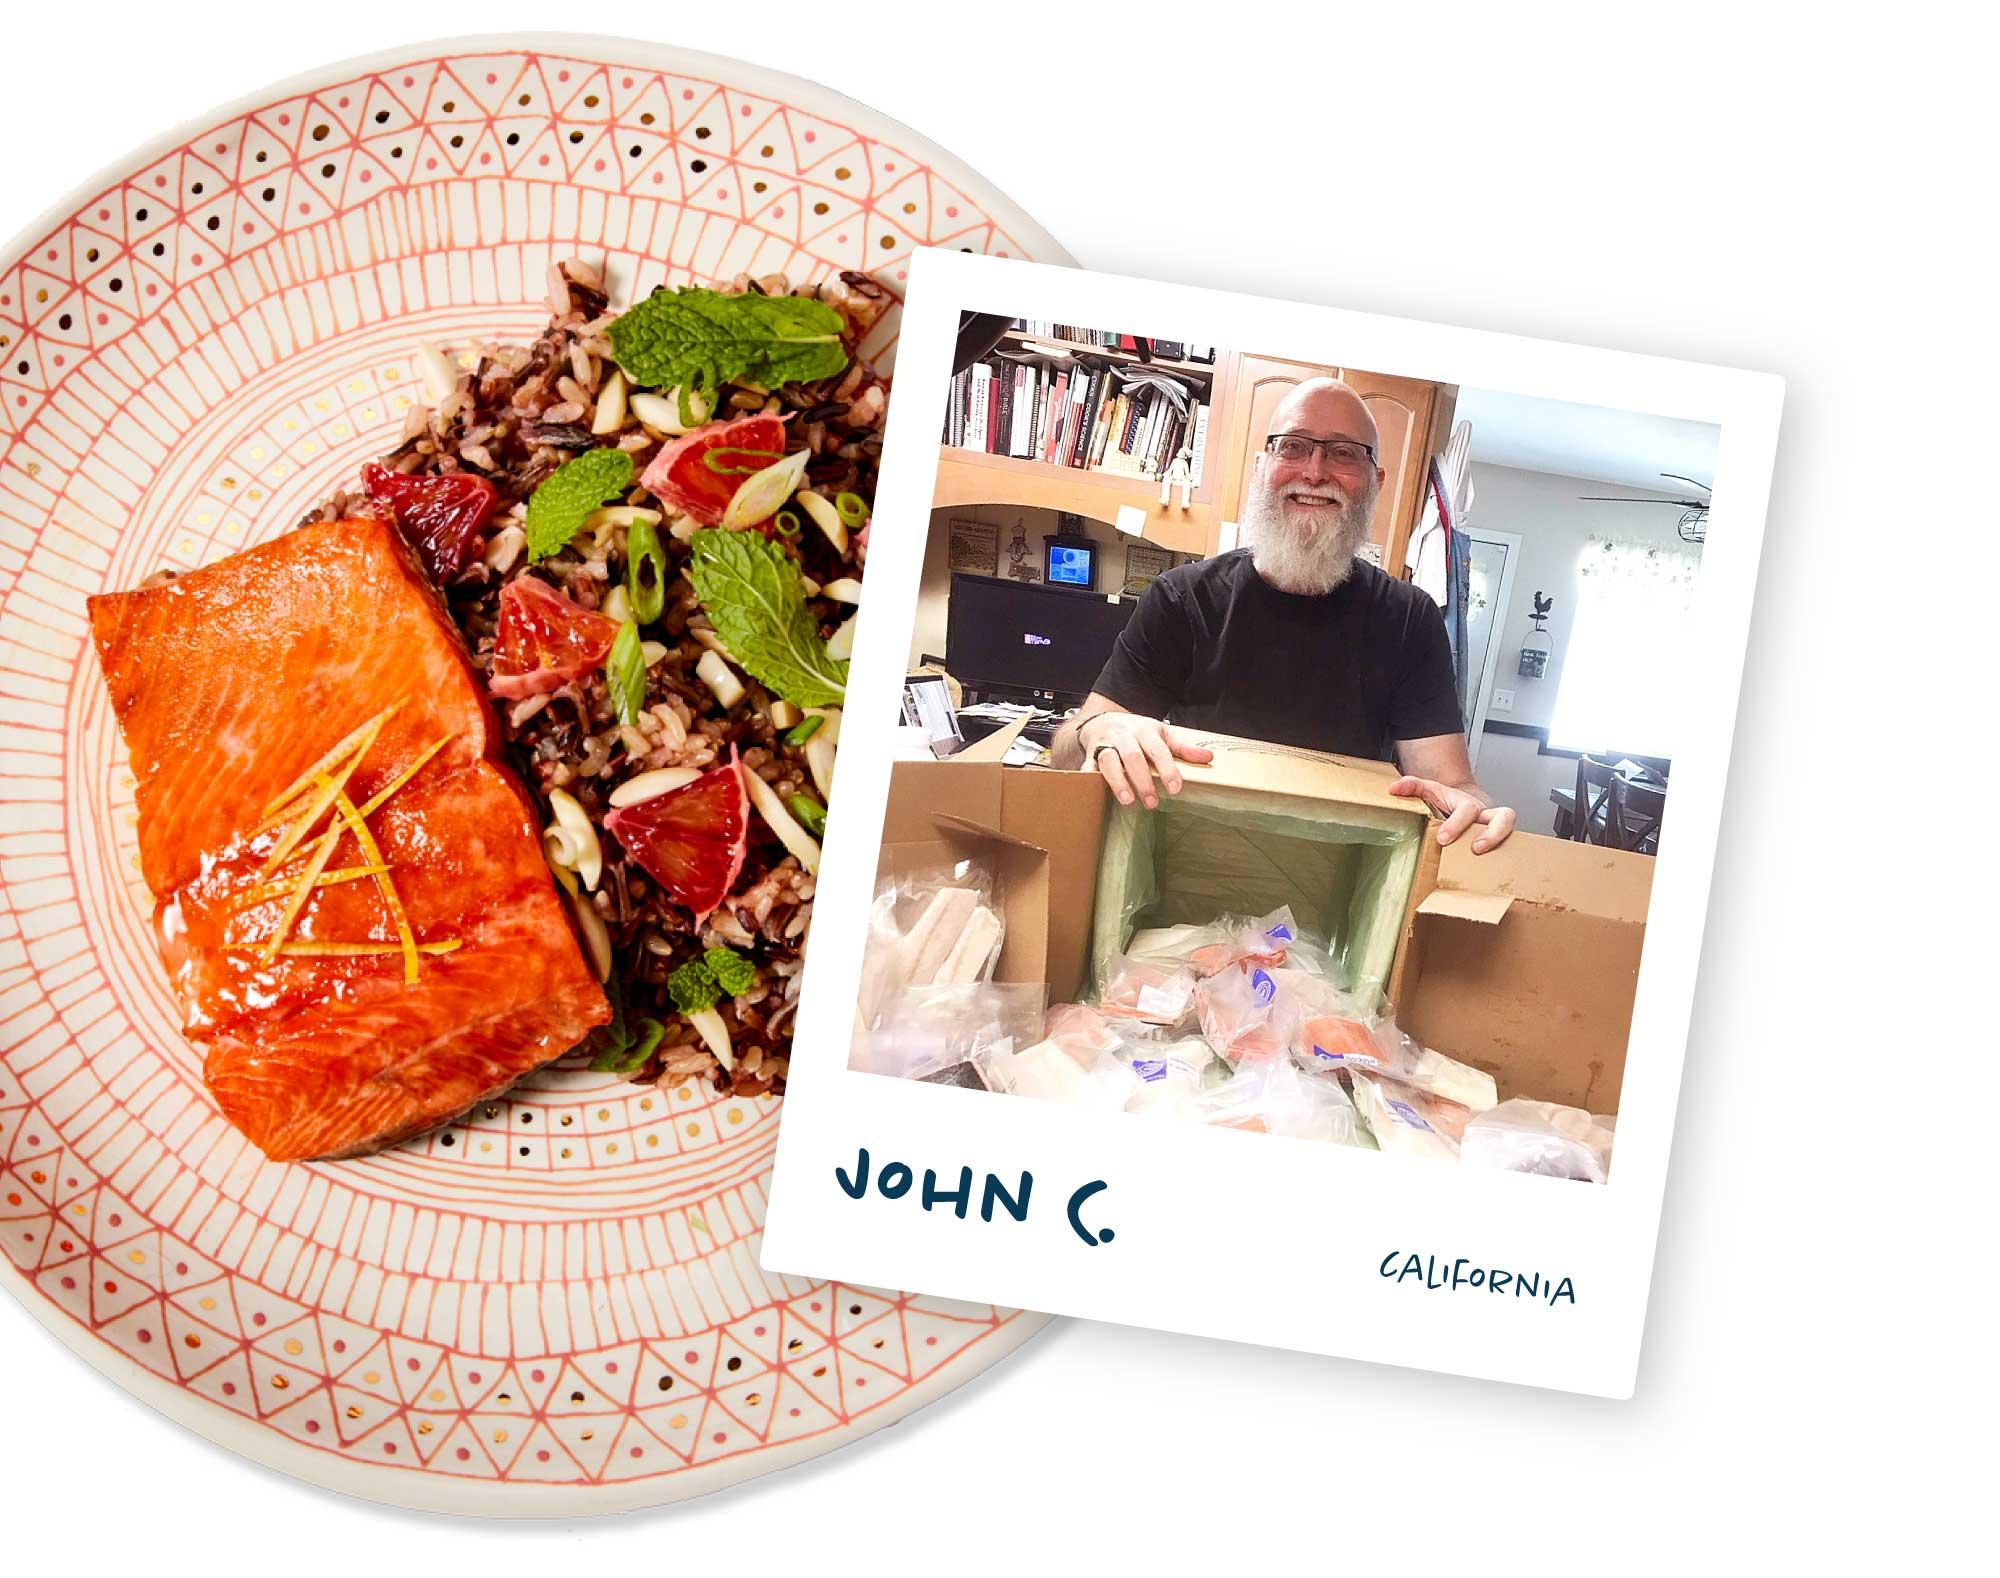 john C review of Wild Alaskan Company